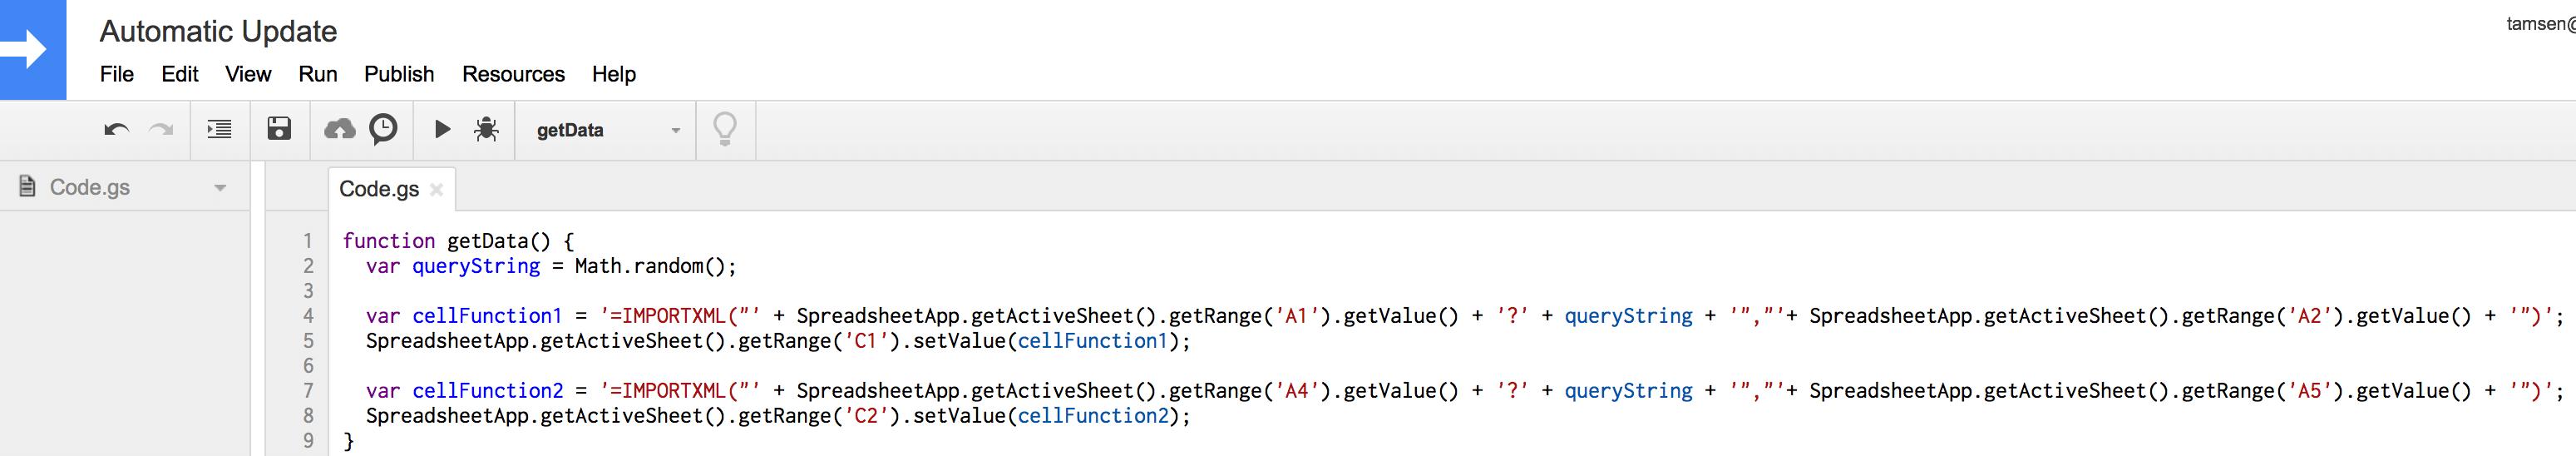 Save_script